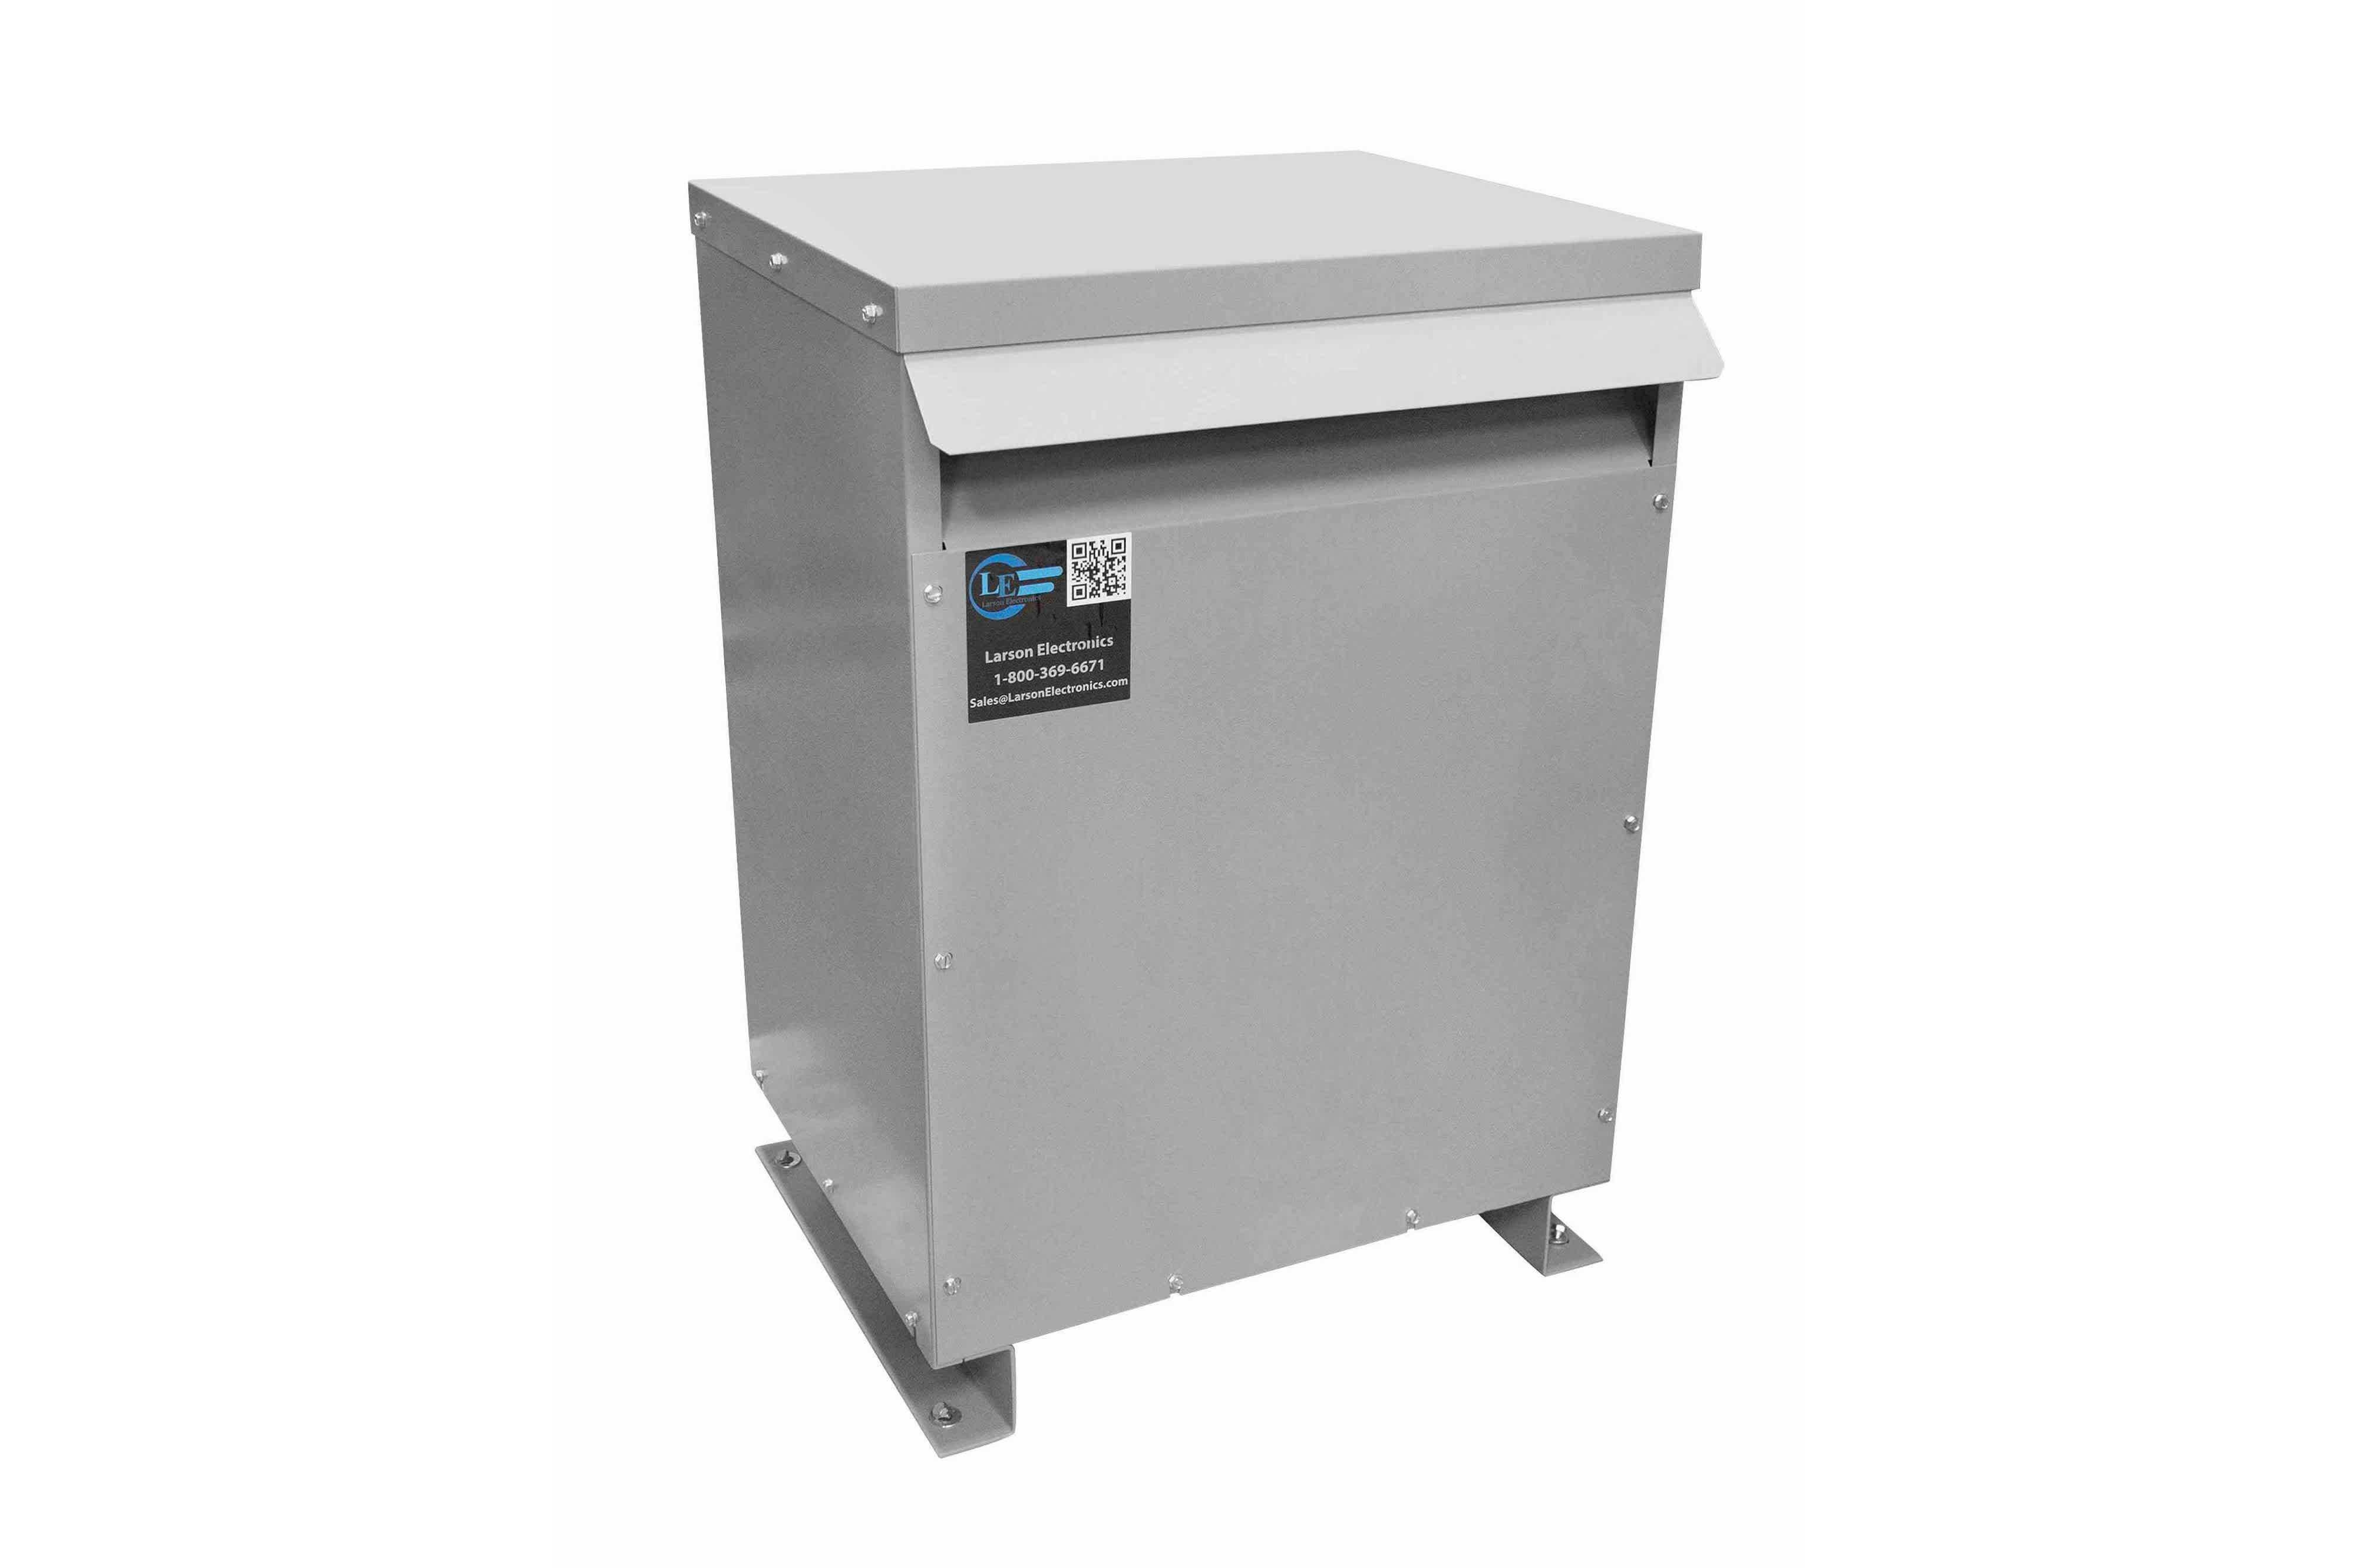 250 kVA 3PH Isolation Transformer, 415V Wye Primary, 208V Delta Secondary, N3R, Ventilated, 60 Hz